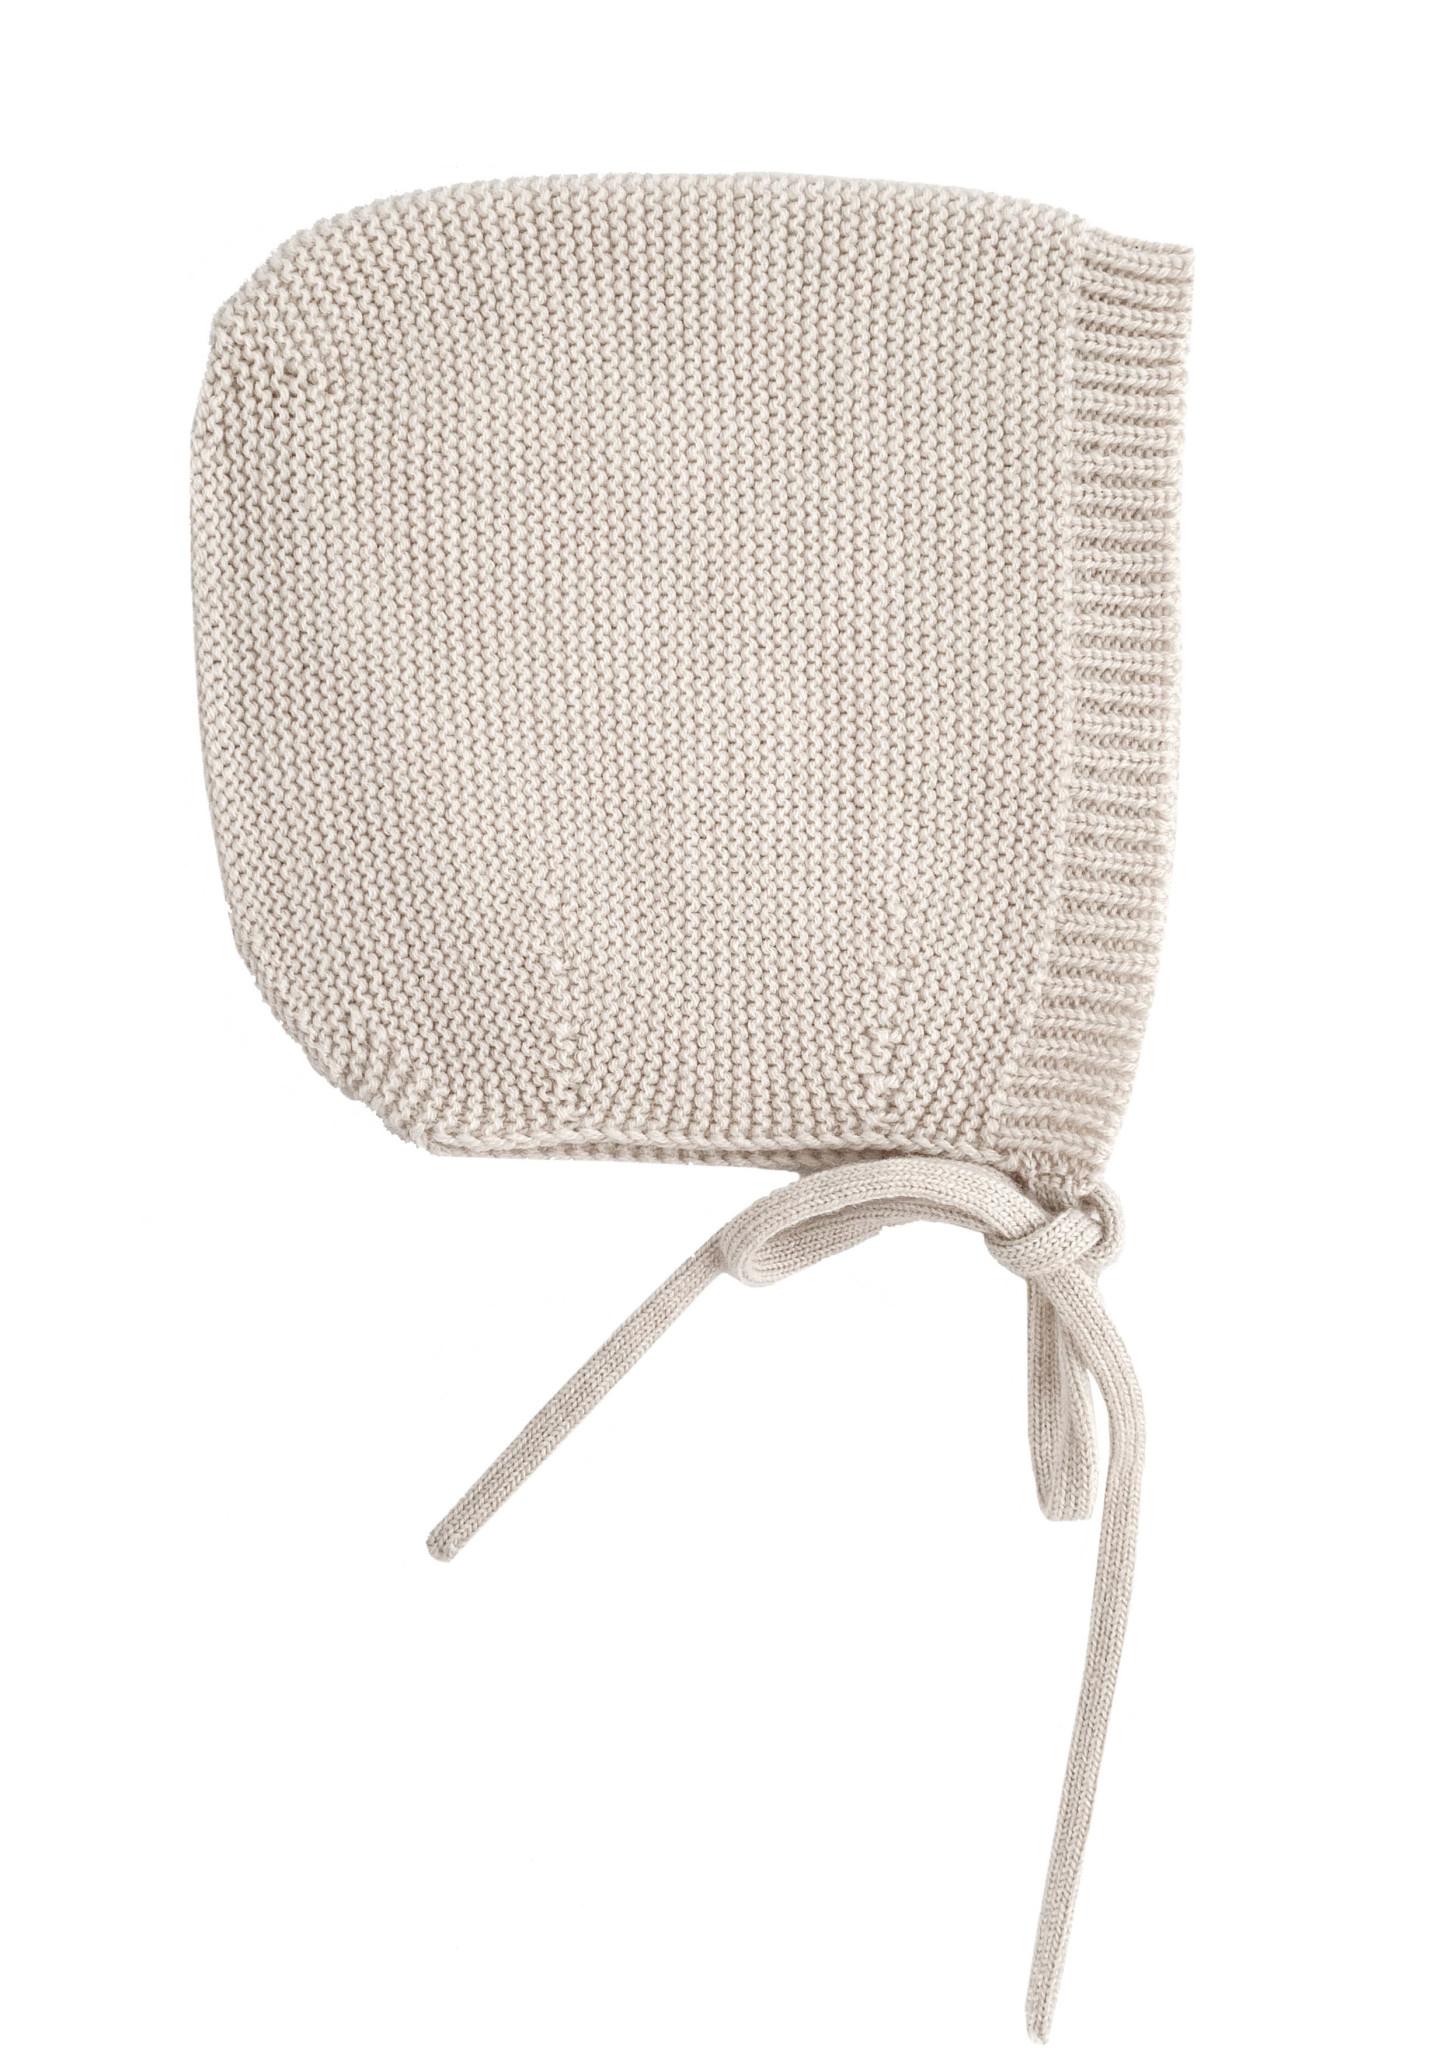 Bonnet dolly off-white-3